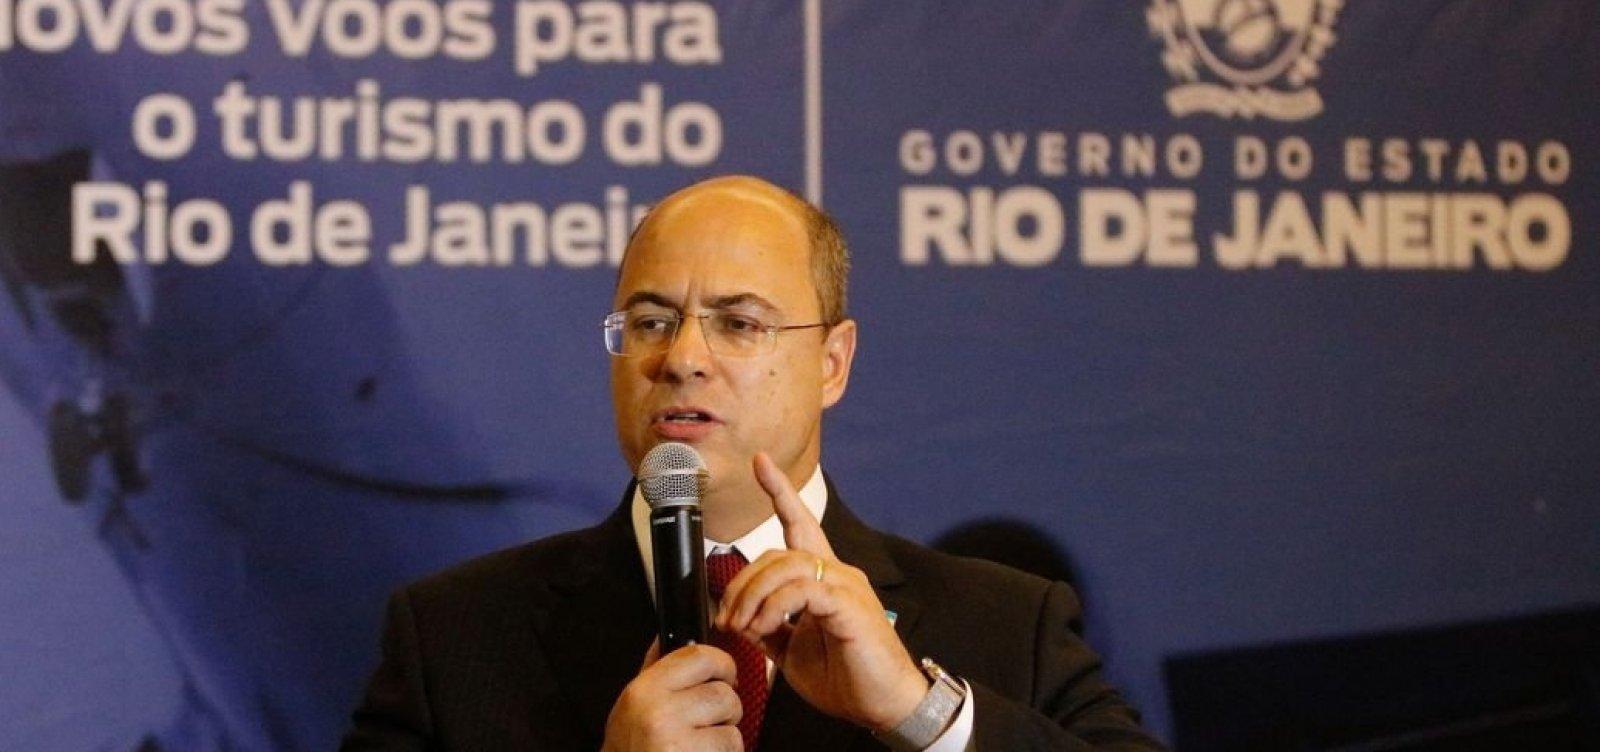 [Planalto recebe denúncia de que Witzel atua para incriminar Bolsonaro]